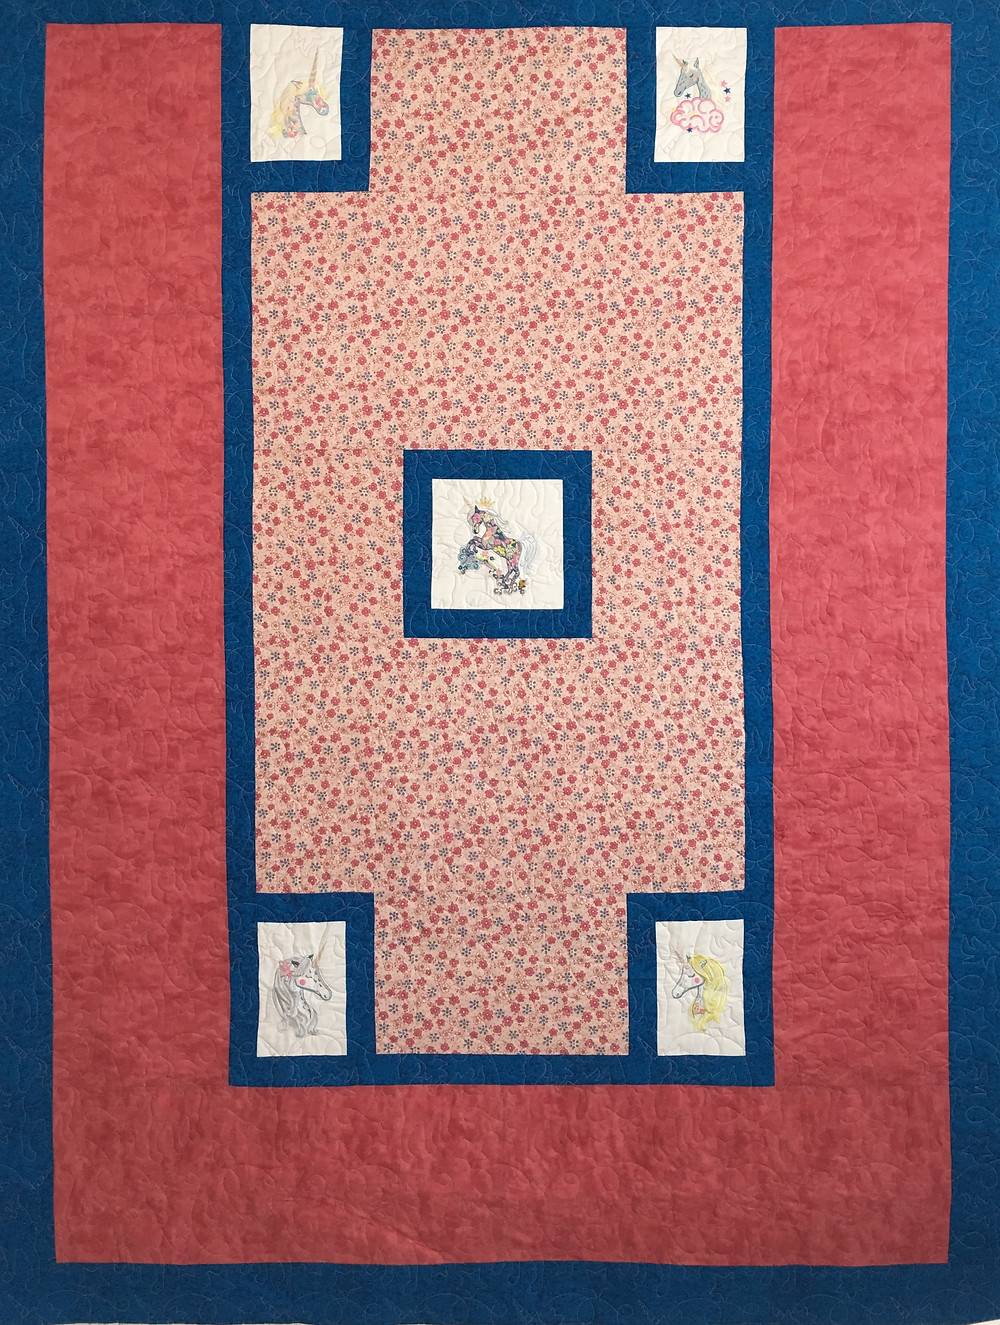 Unicorn Quilt by Peggy Krebs